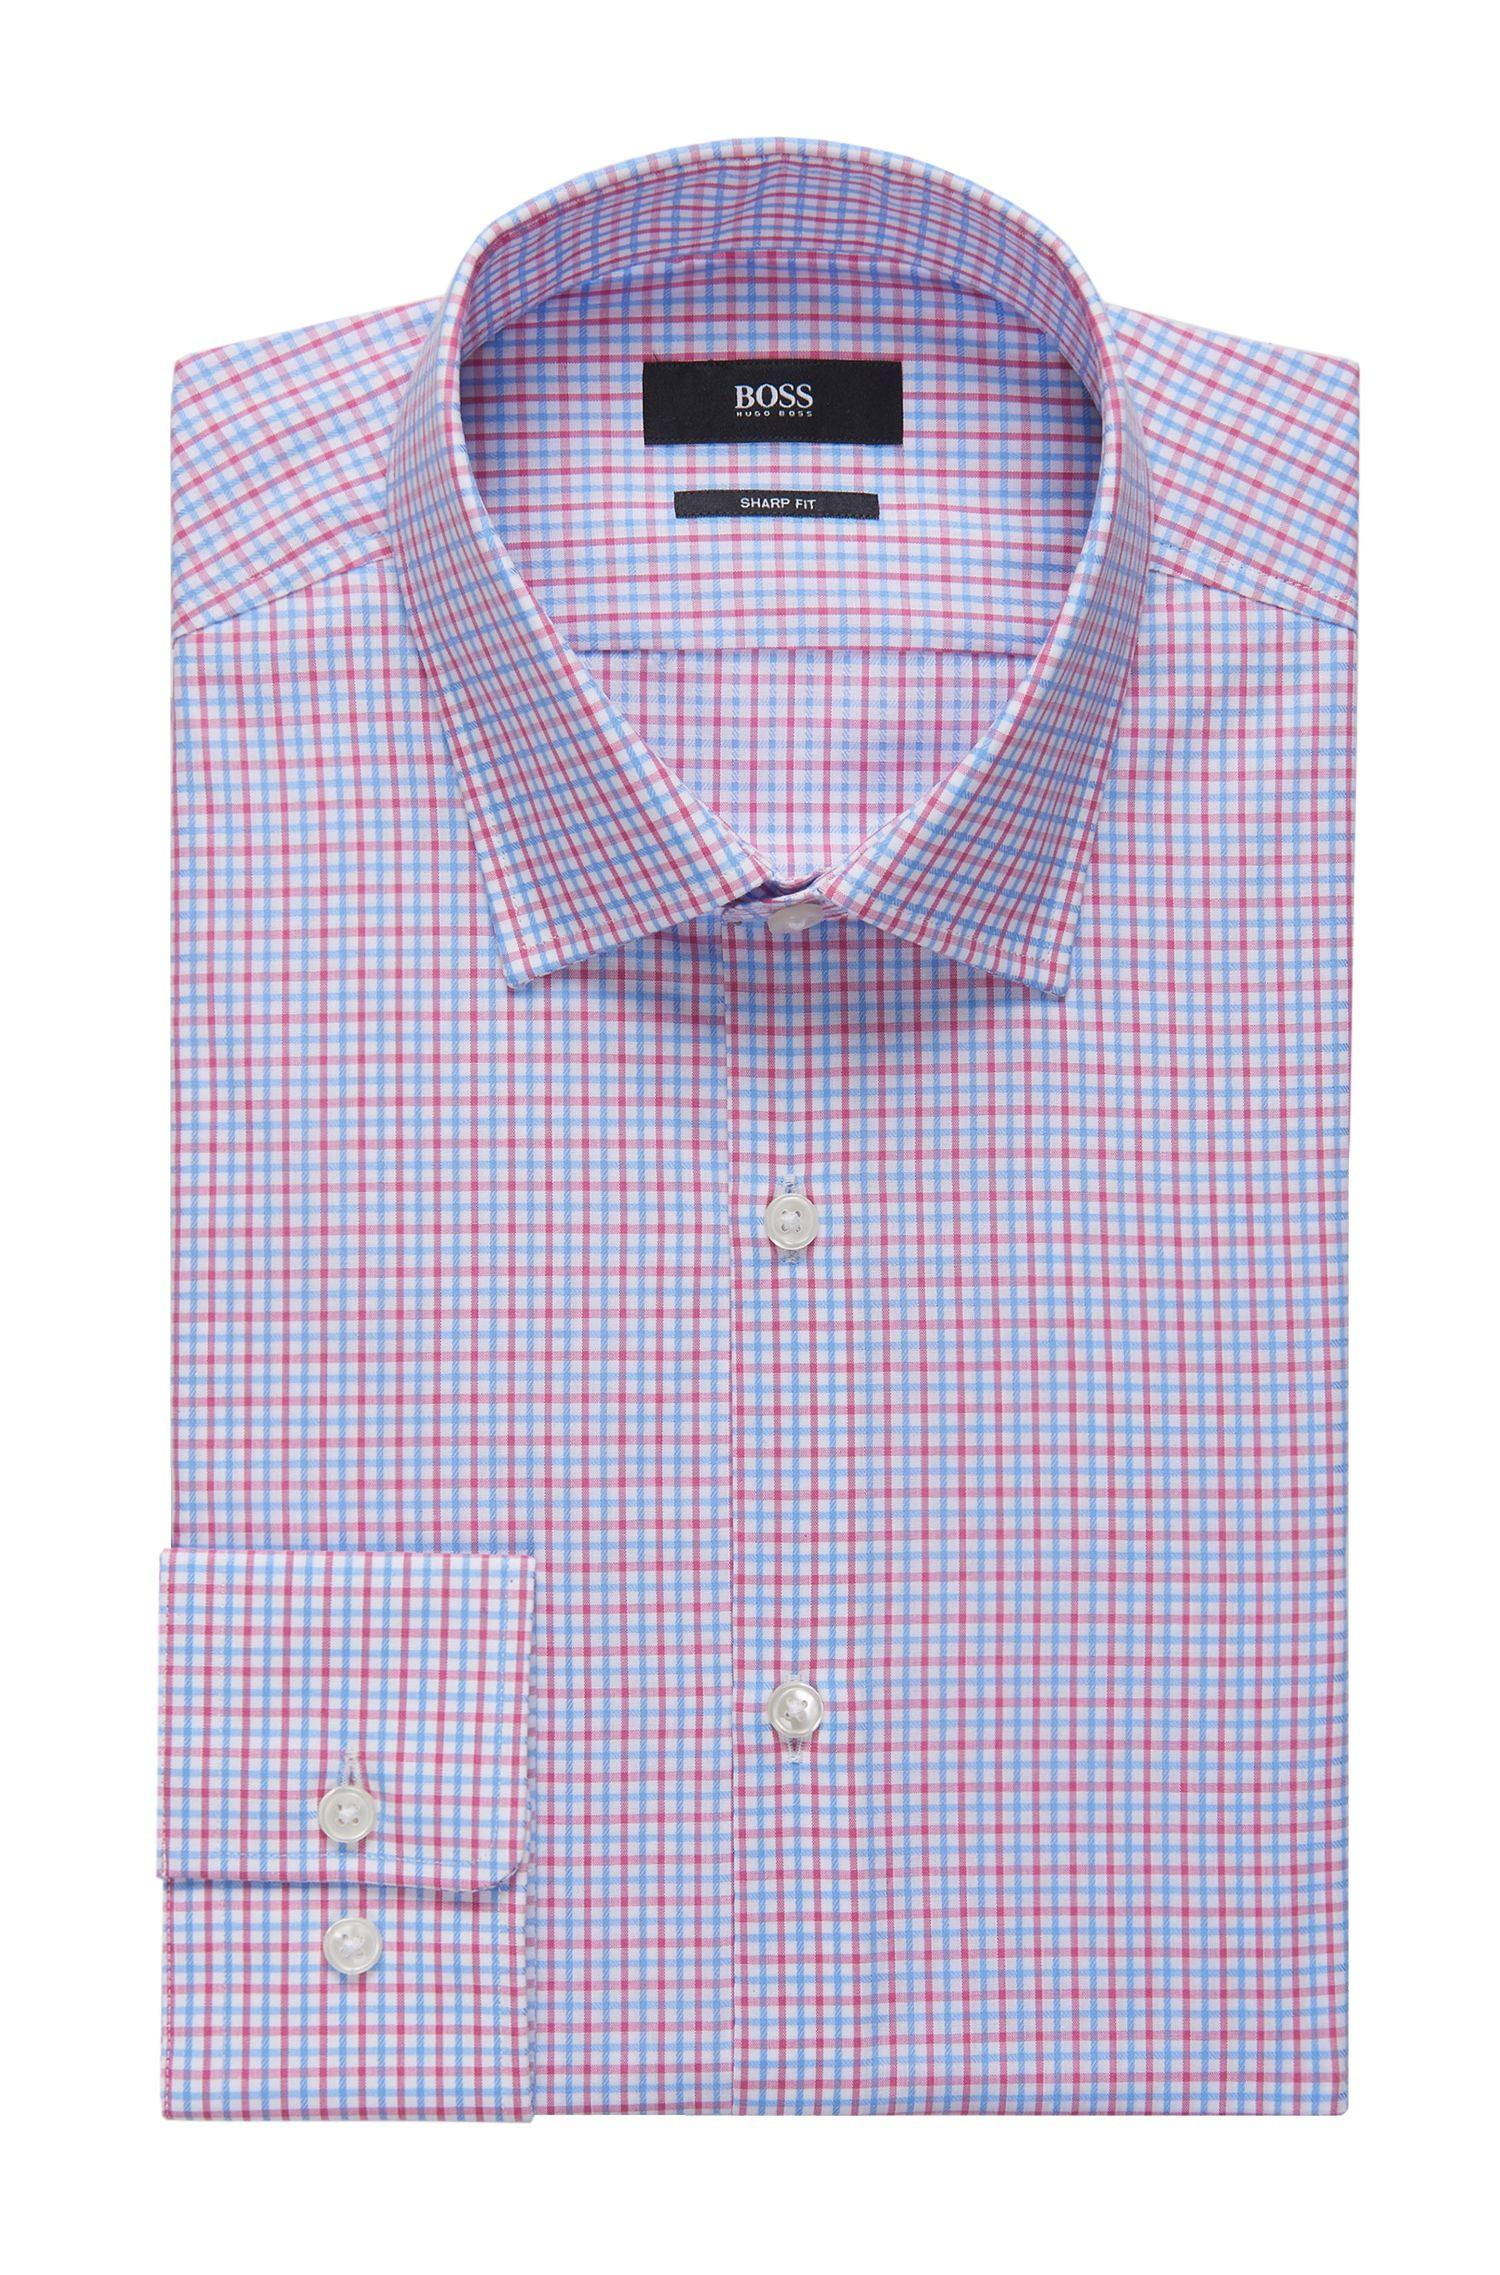 Tattersall Cotton Dress Shirt, Sharp Fit | Marley US